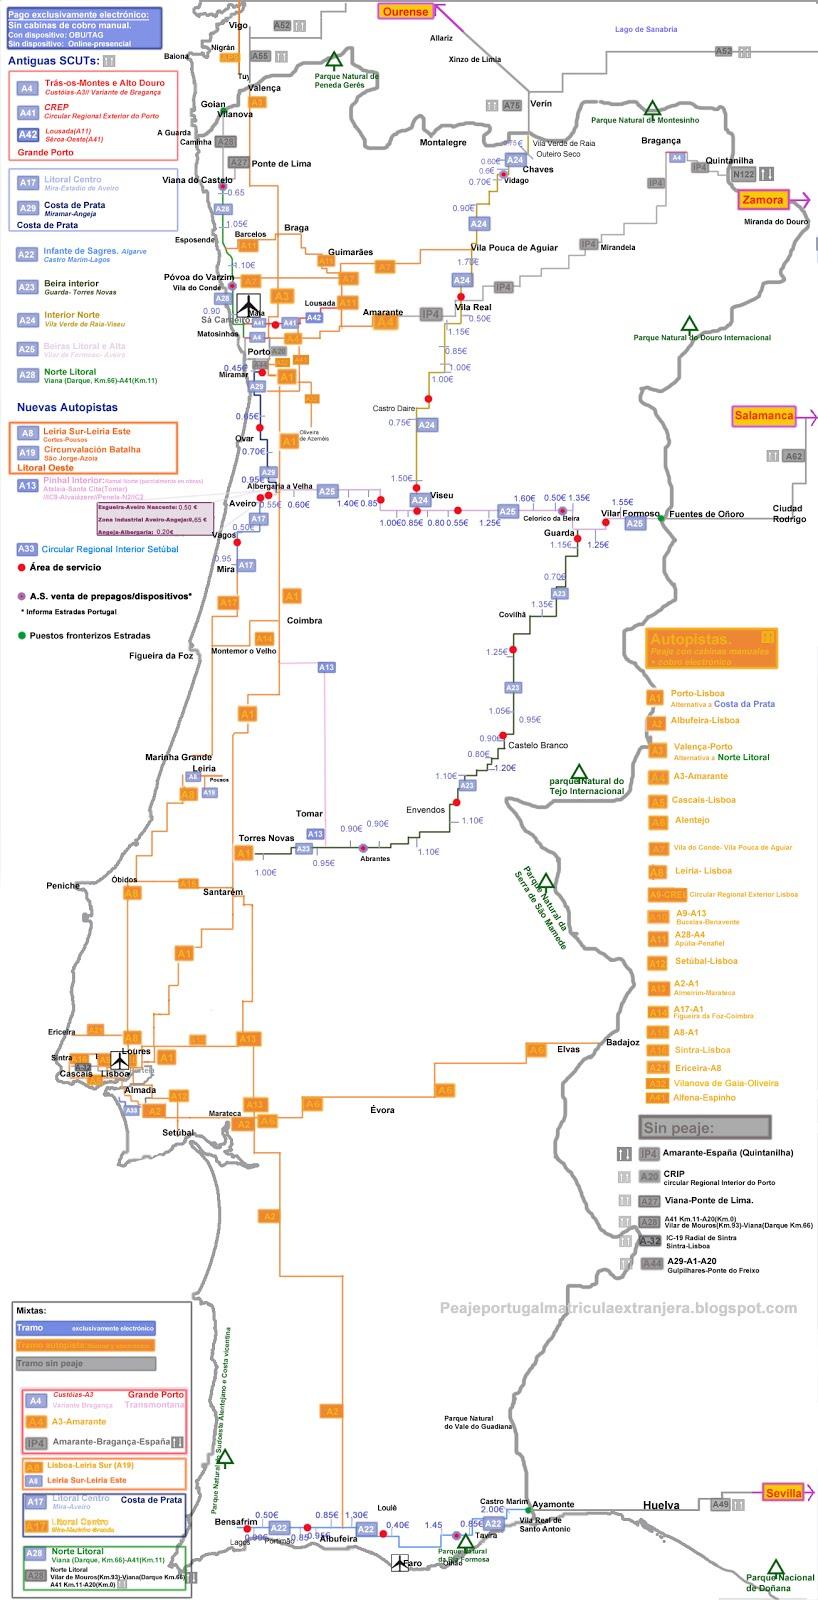 scuts portugal mapa Nuevos peajes en Portugal (ex SCUTs) Mapas, comparativas y pago  scuts portugal mapa